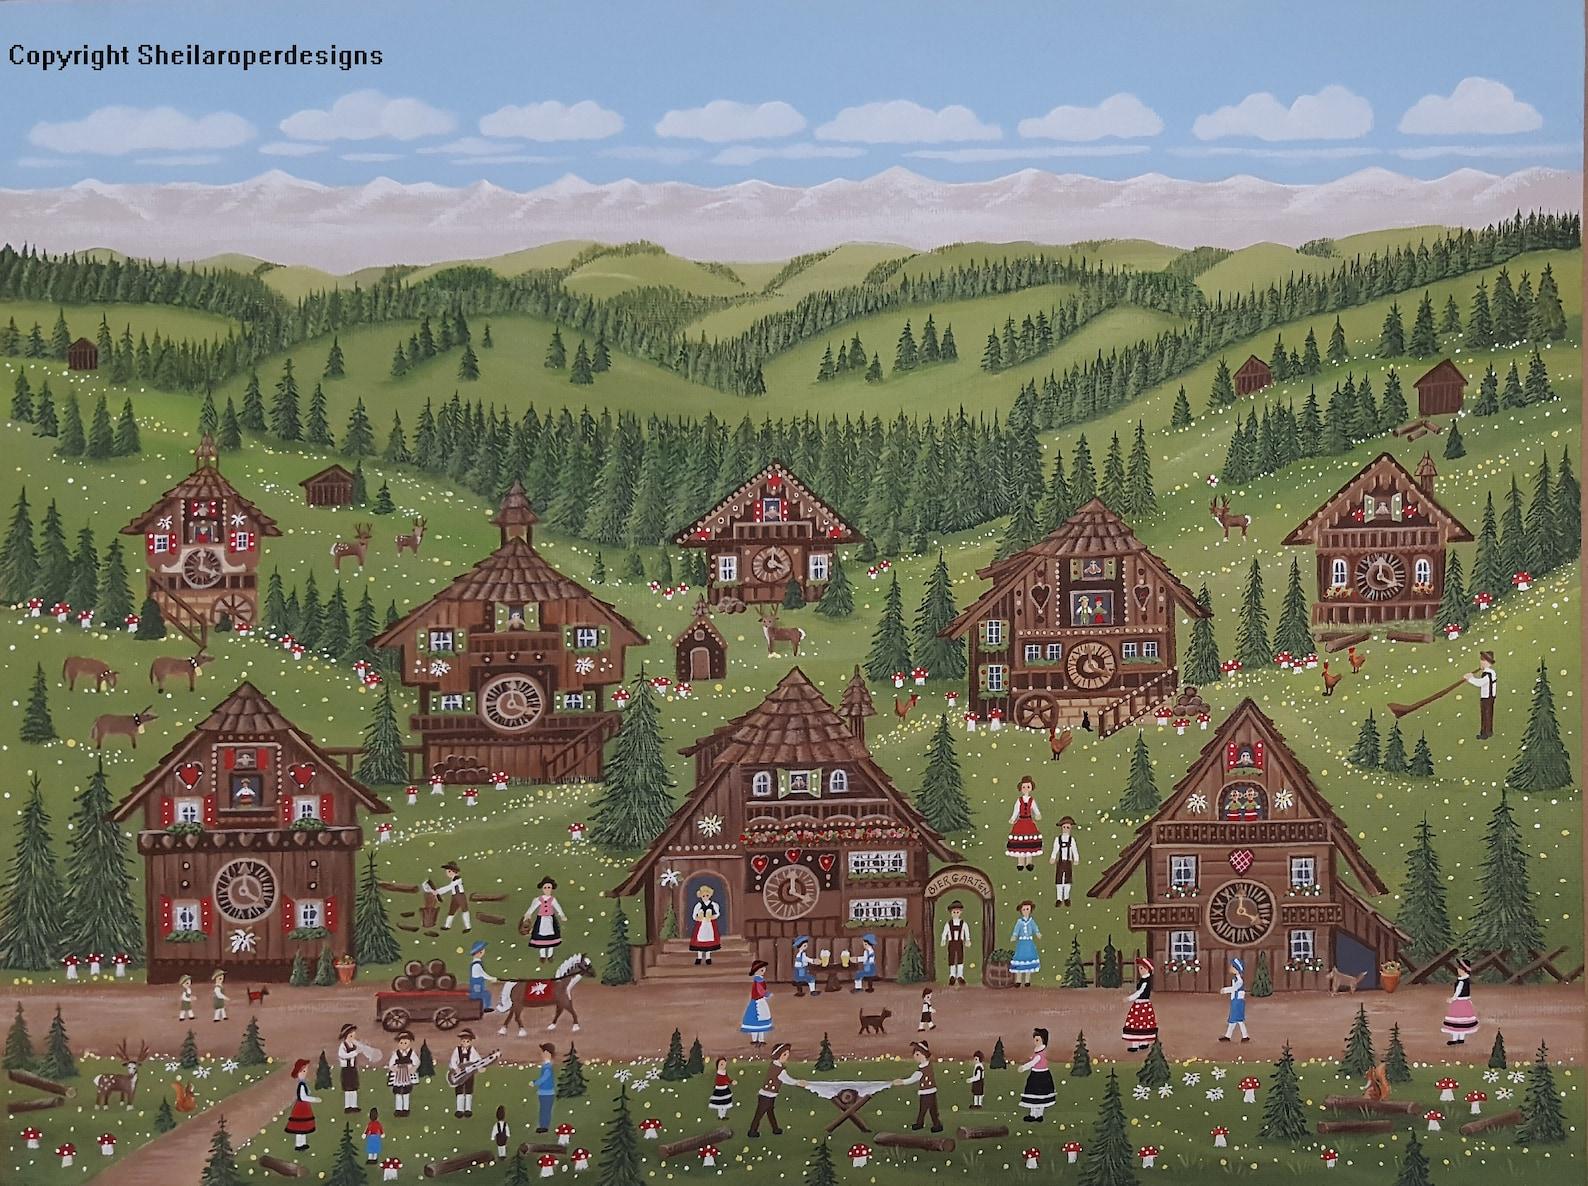 Print: 'The Cuckoo Clock Village' by Sheila Roper